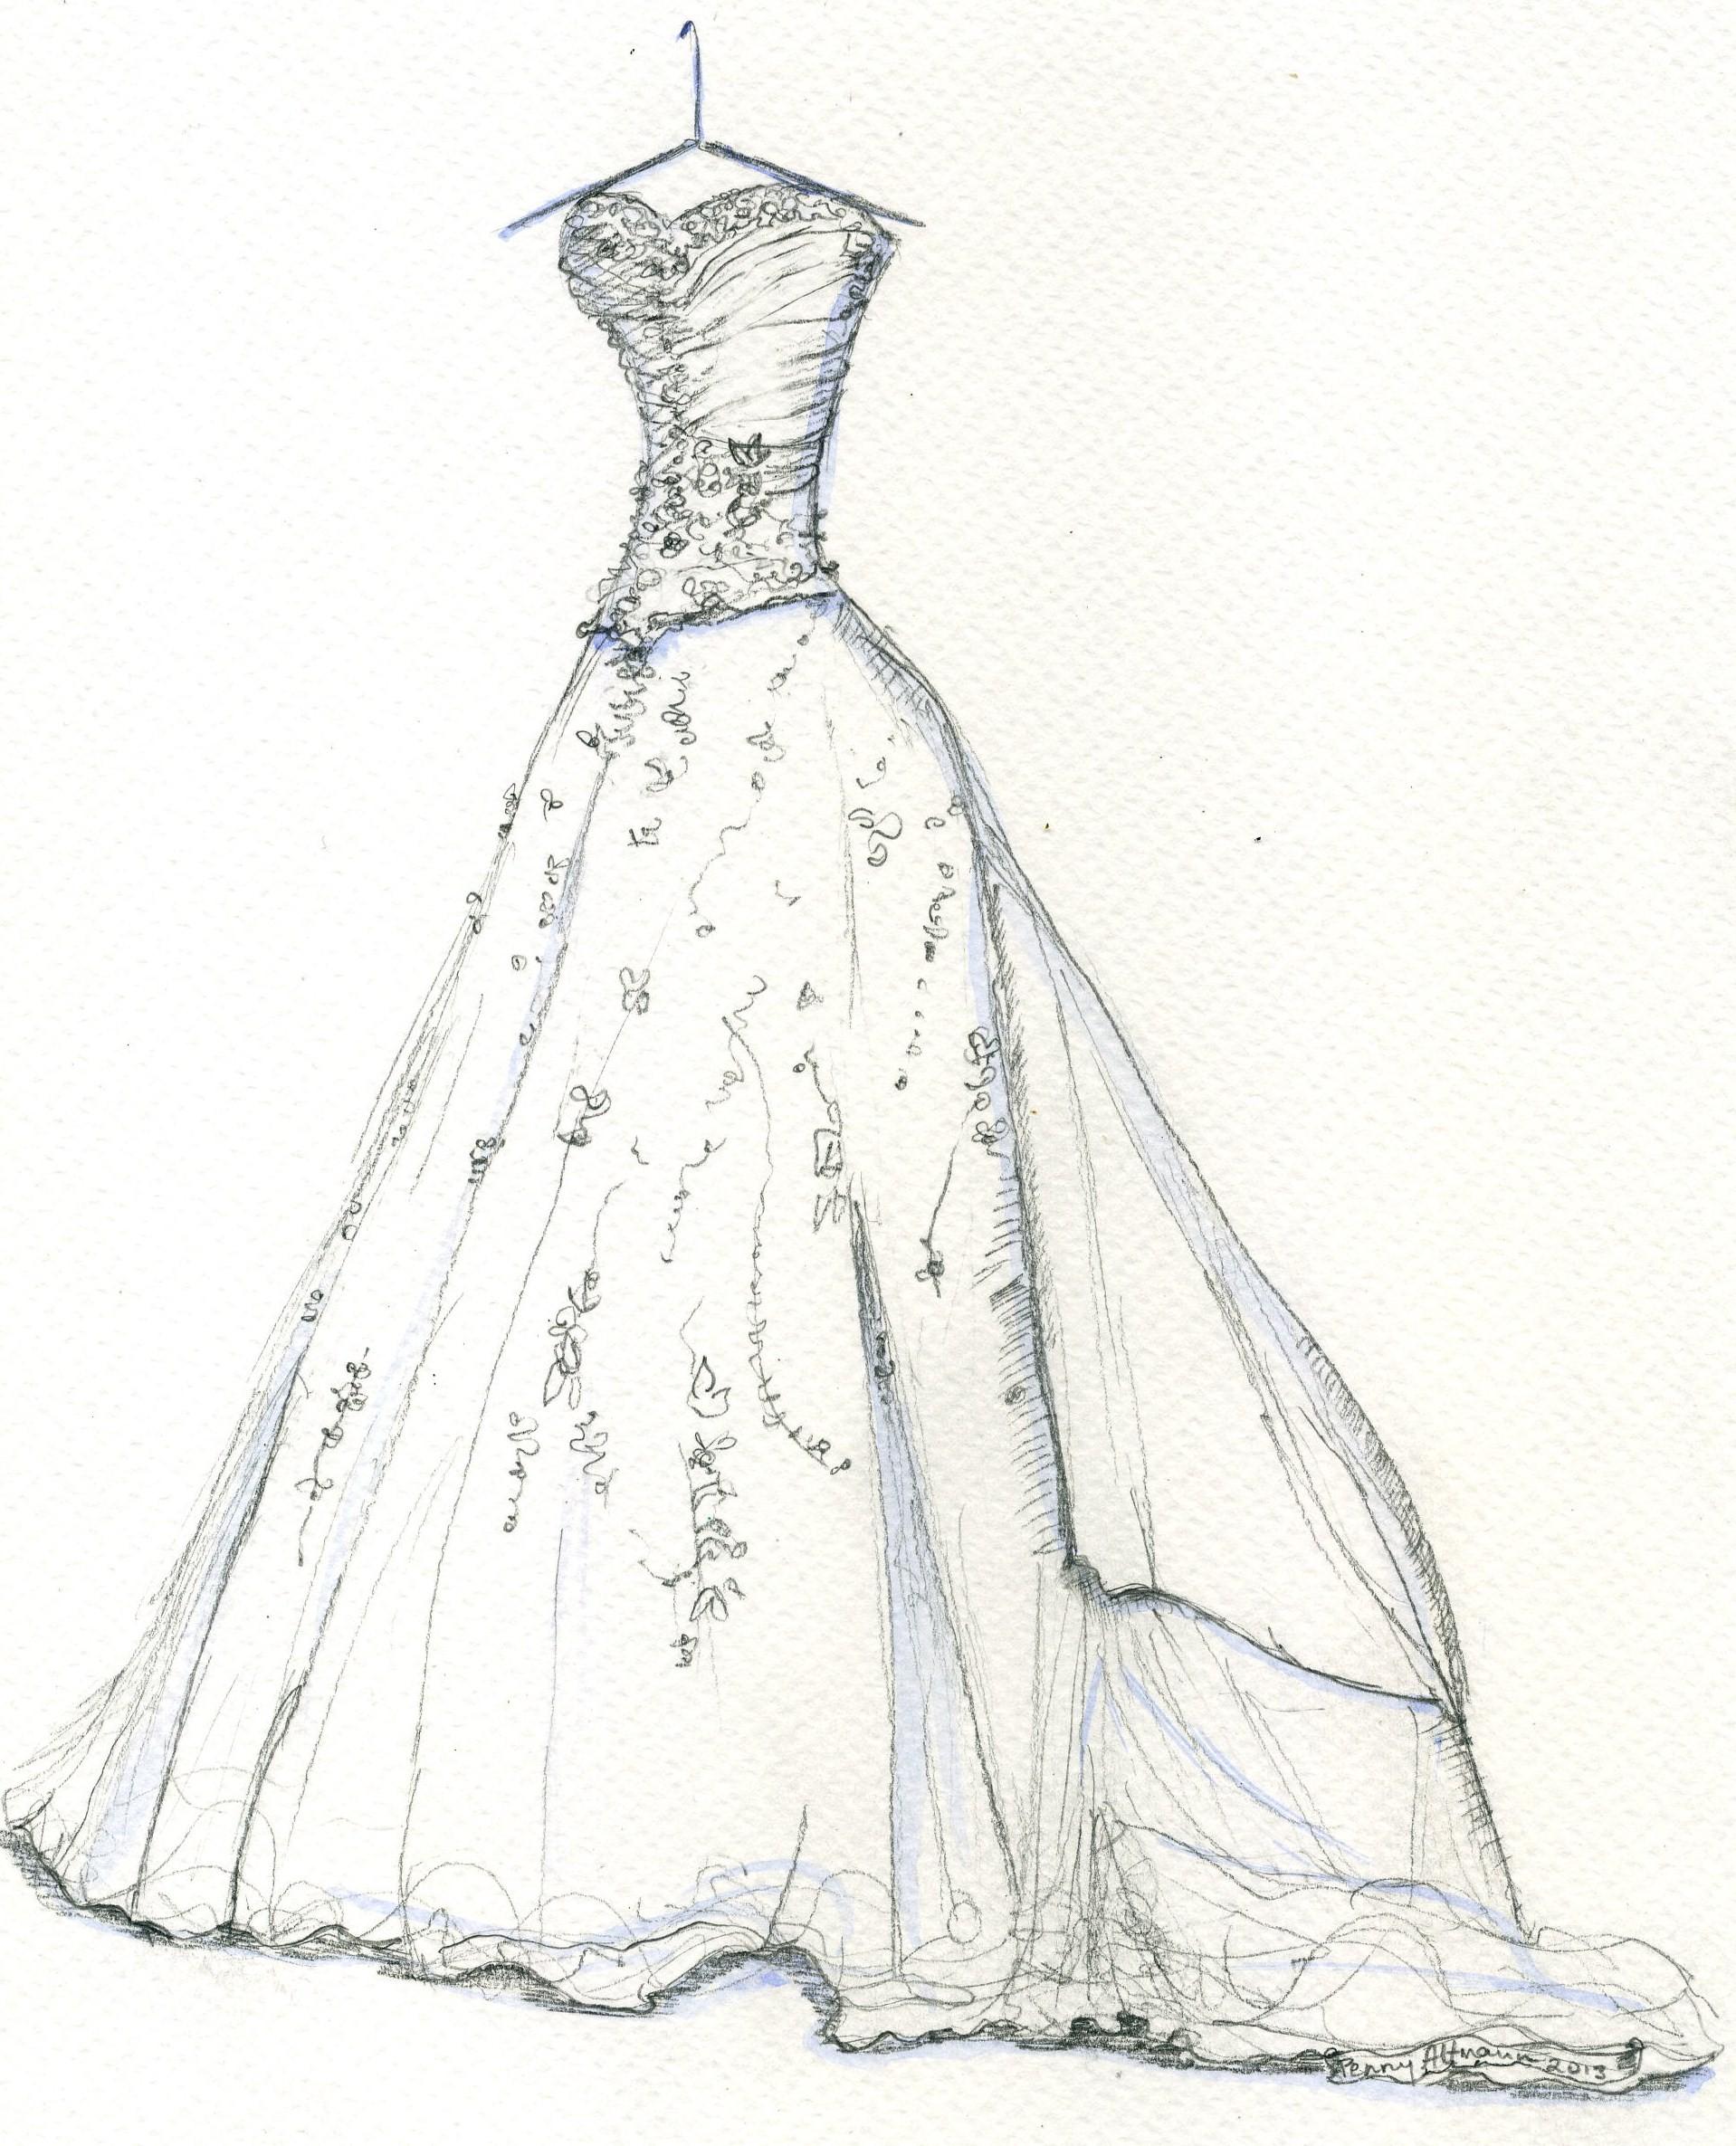 Drawn wedding dress vintage dress Sketches Dress Junoir Sketches Wedding